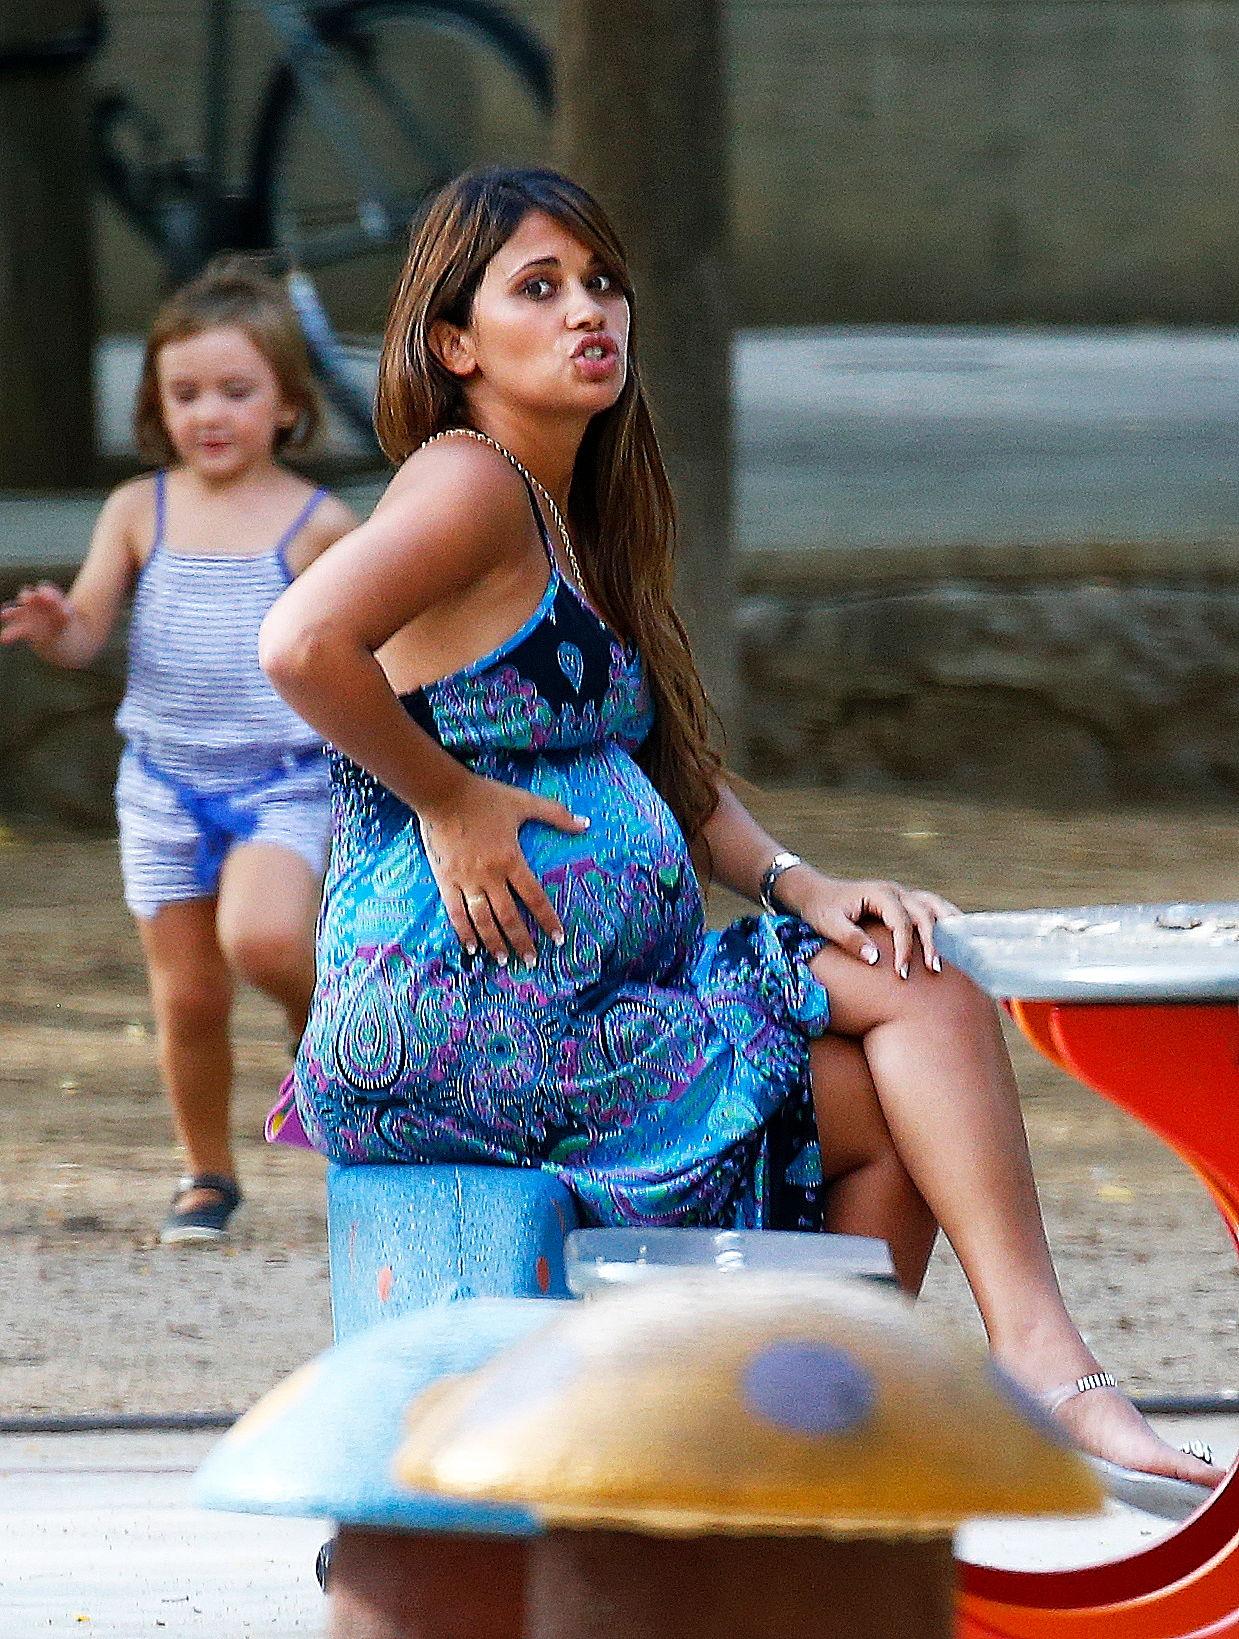 Antonella Roccuzzo Esposa De Lionel Messi Luce Su Pancita De Embarazo